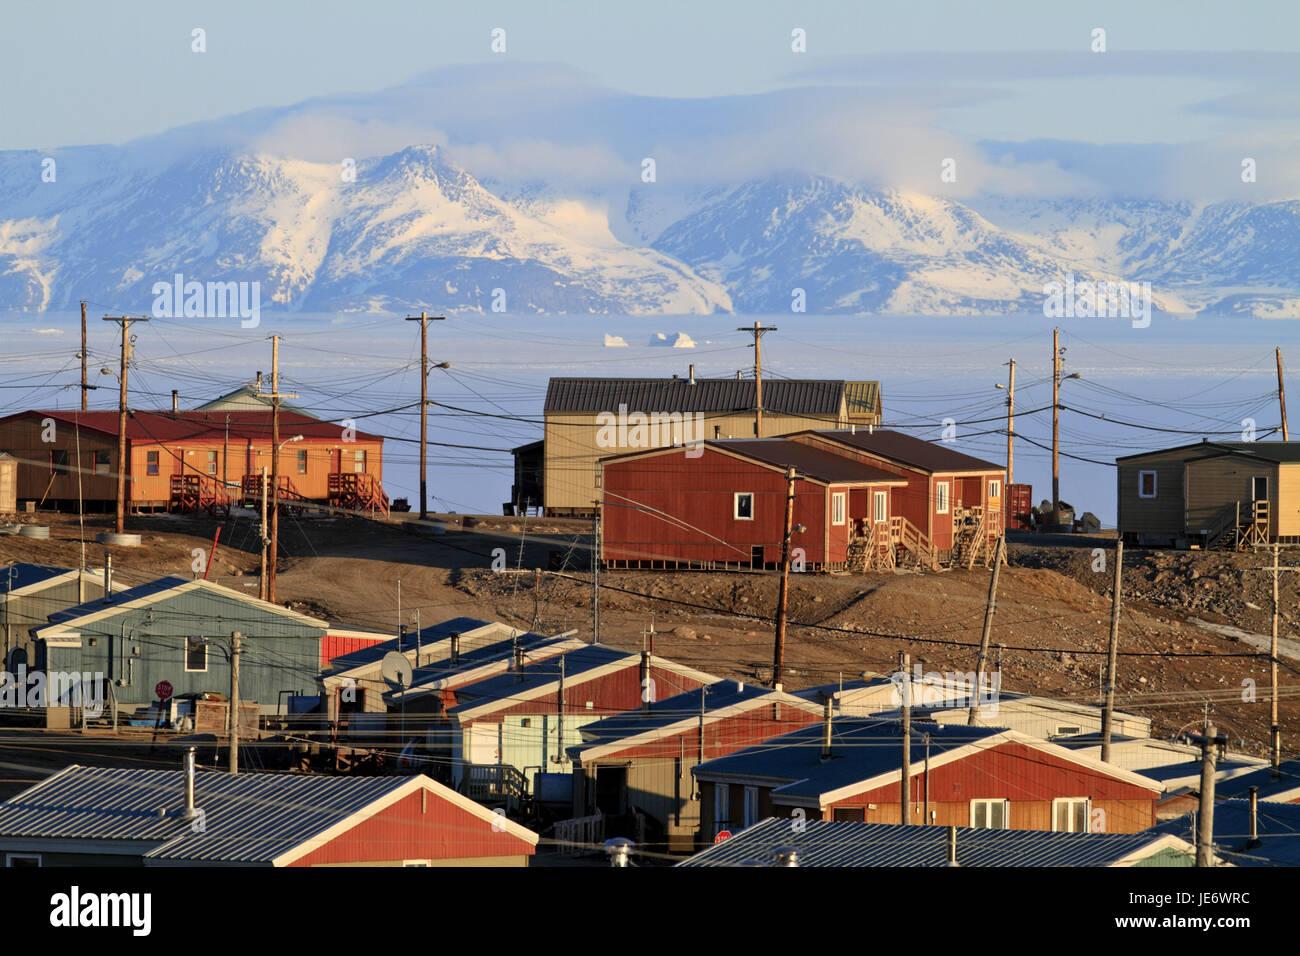 North America, Canada, Nordkanada, Nunavut, Baffin Iceland, Eclipse sound, Pond Inlet, - Stock Image